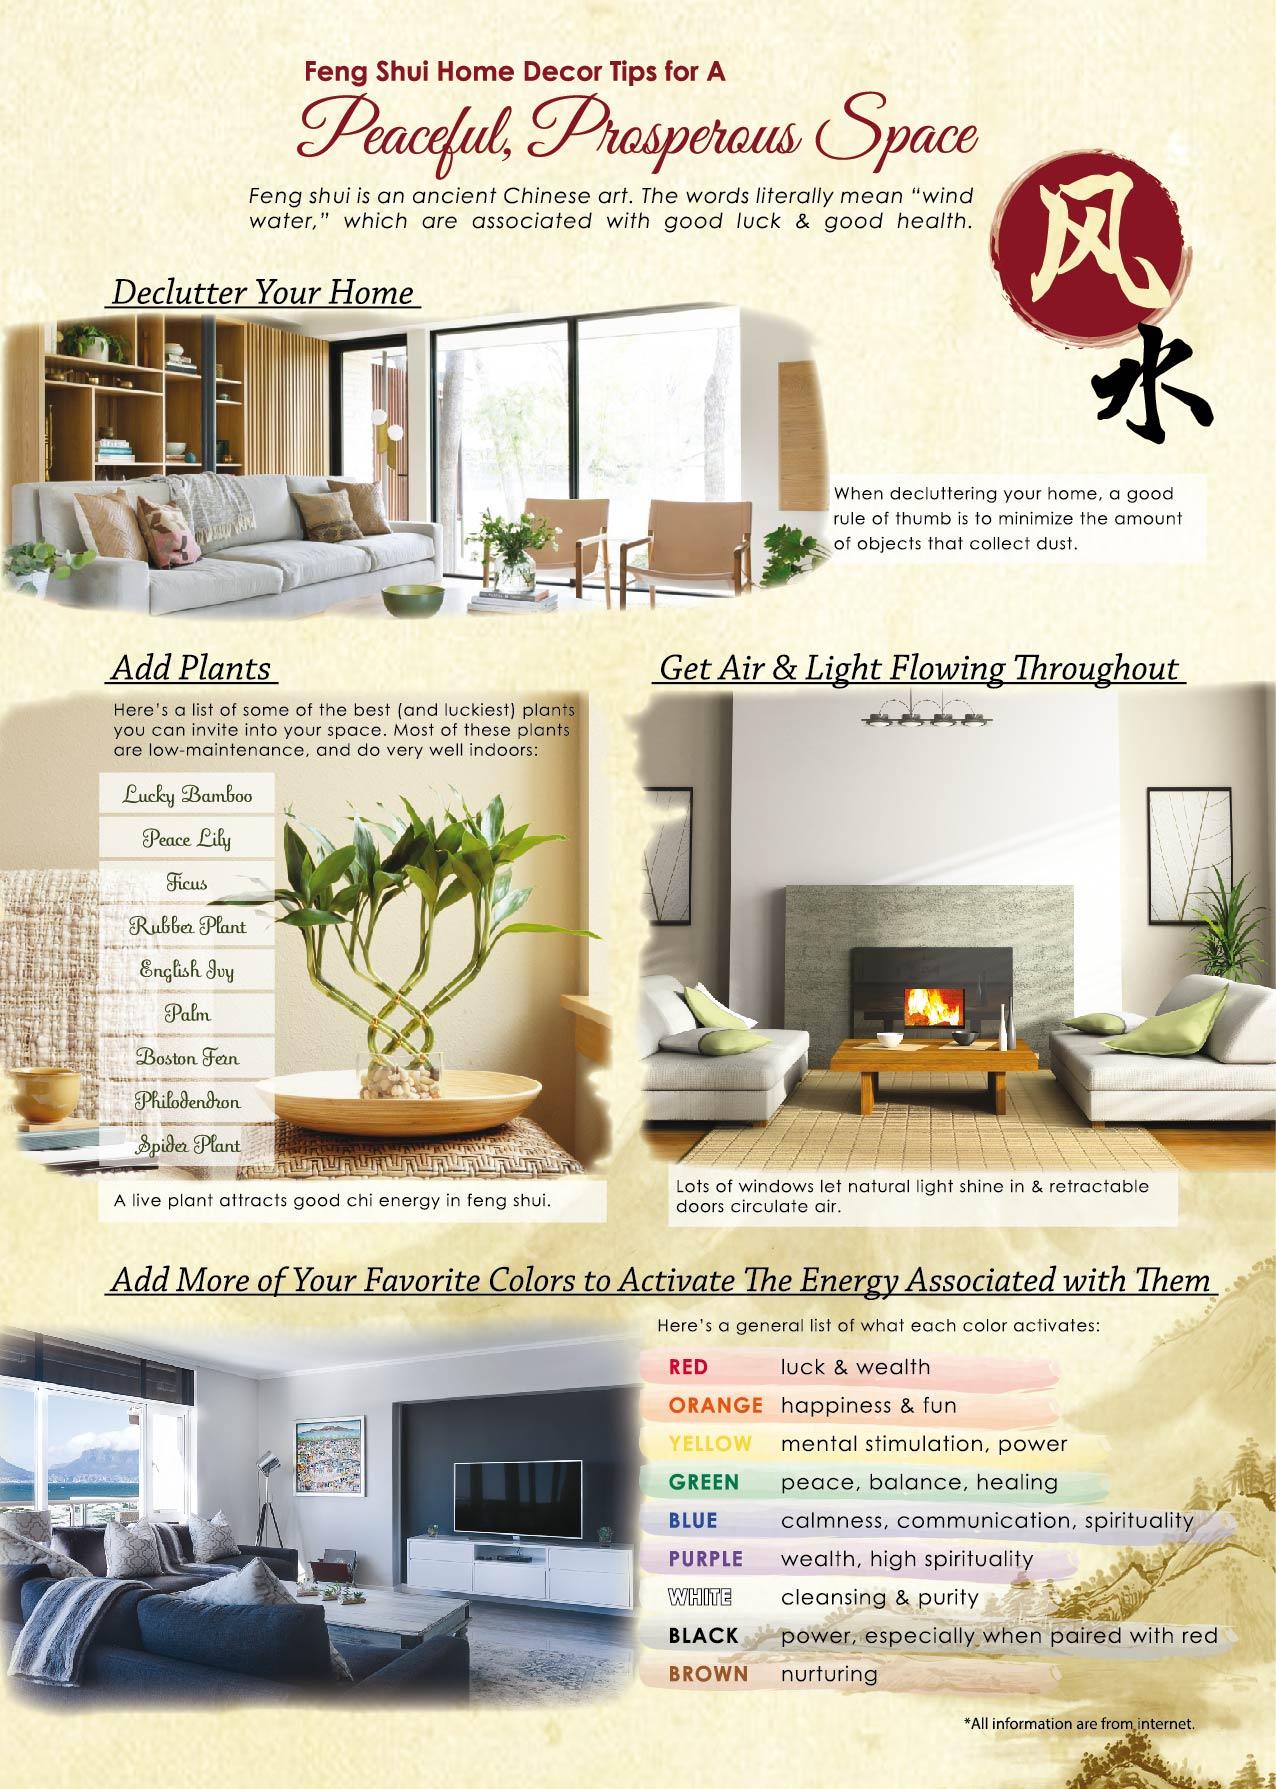 Feng Shui Home Decor Tips